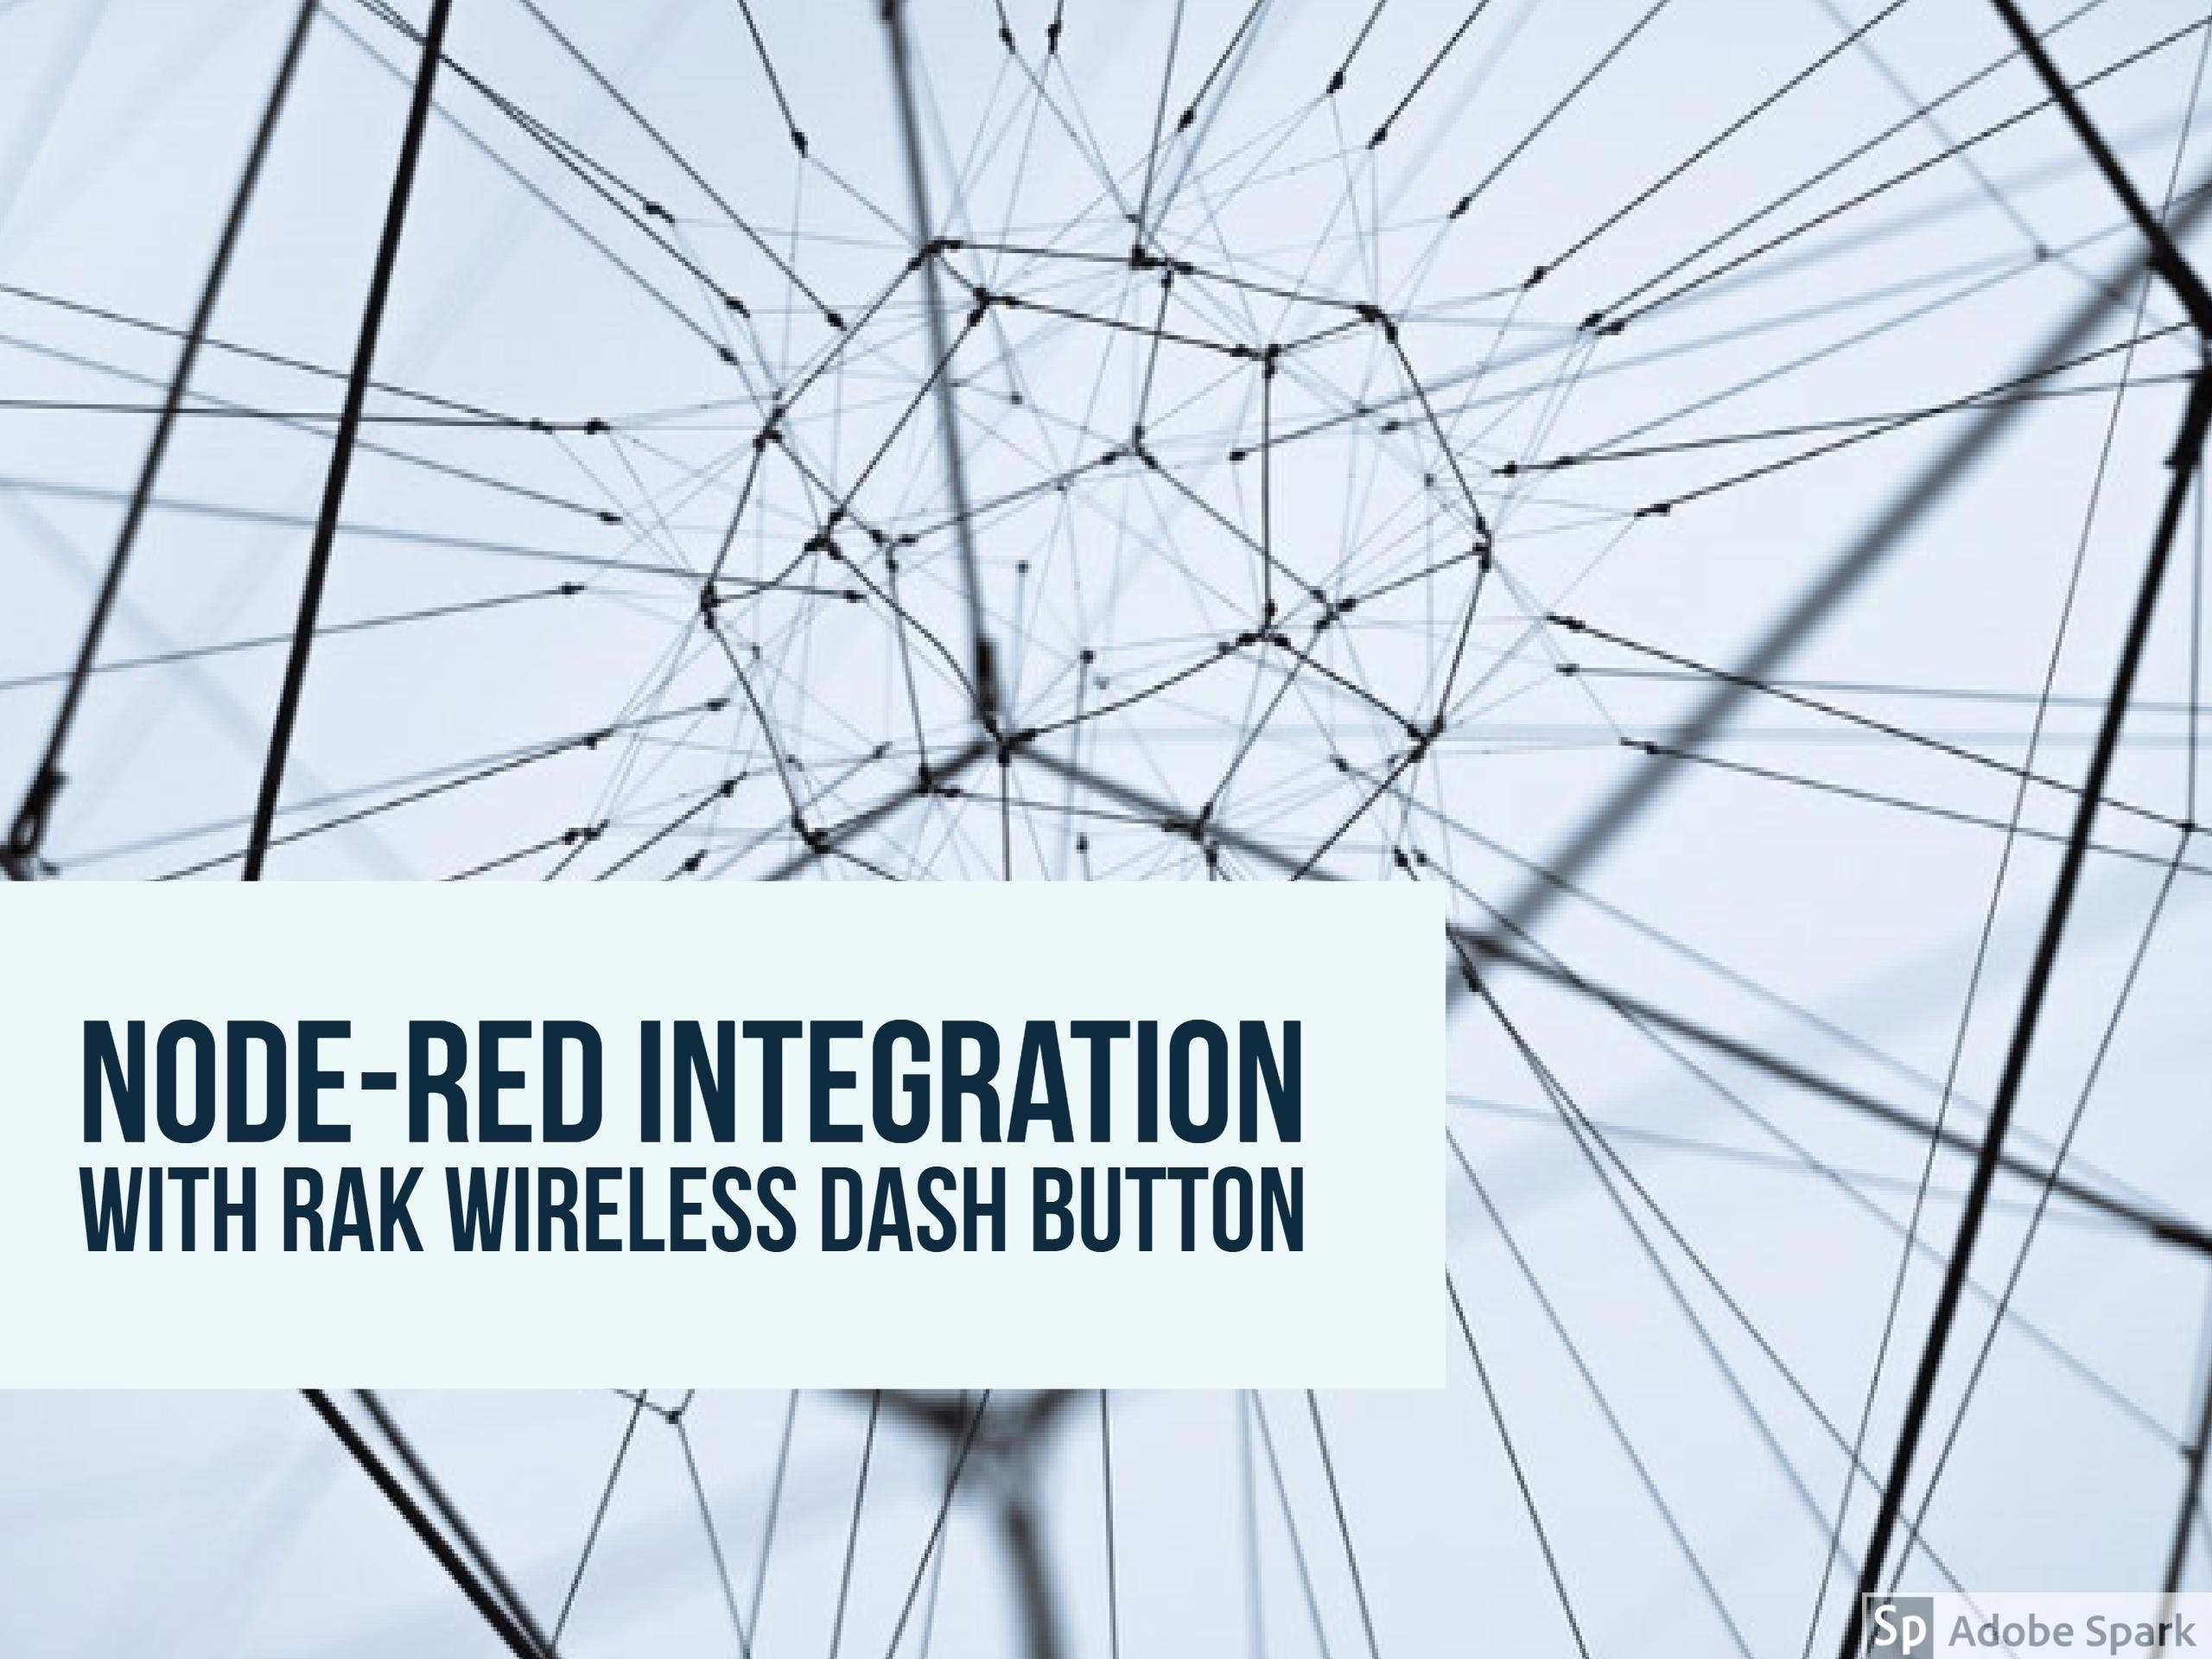 Node-RED Integration with RAK wireless DASH Button